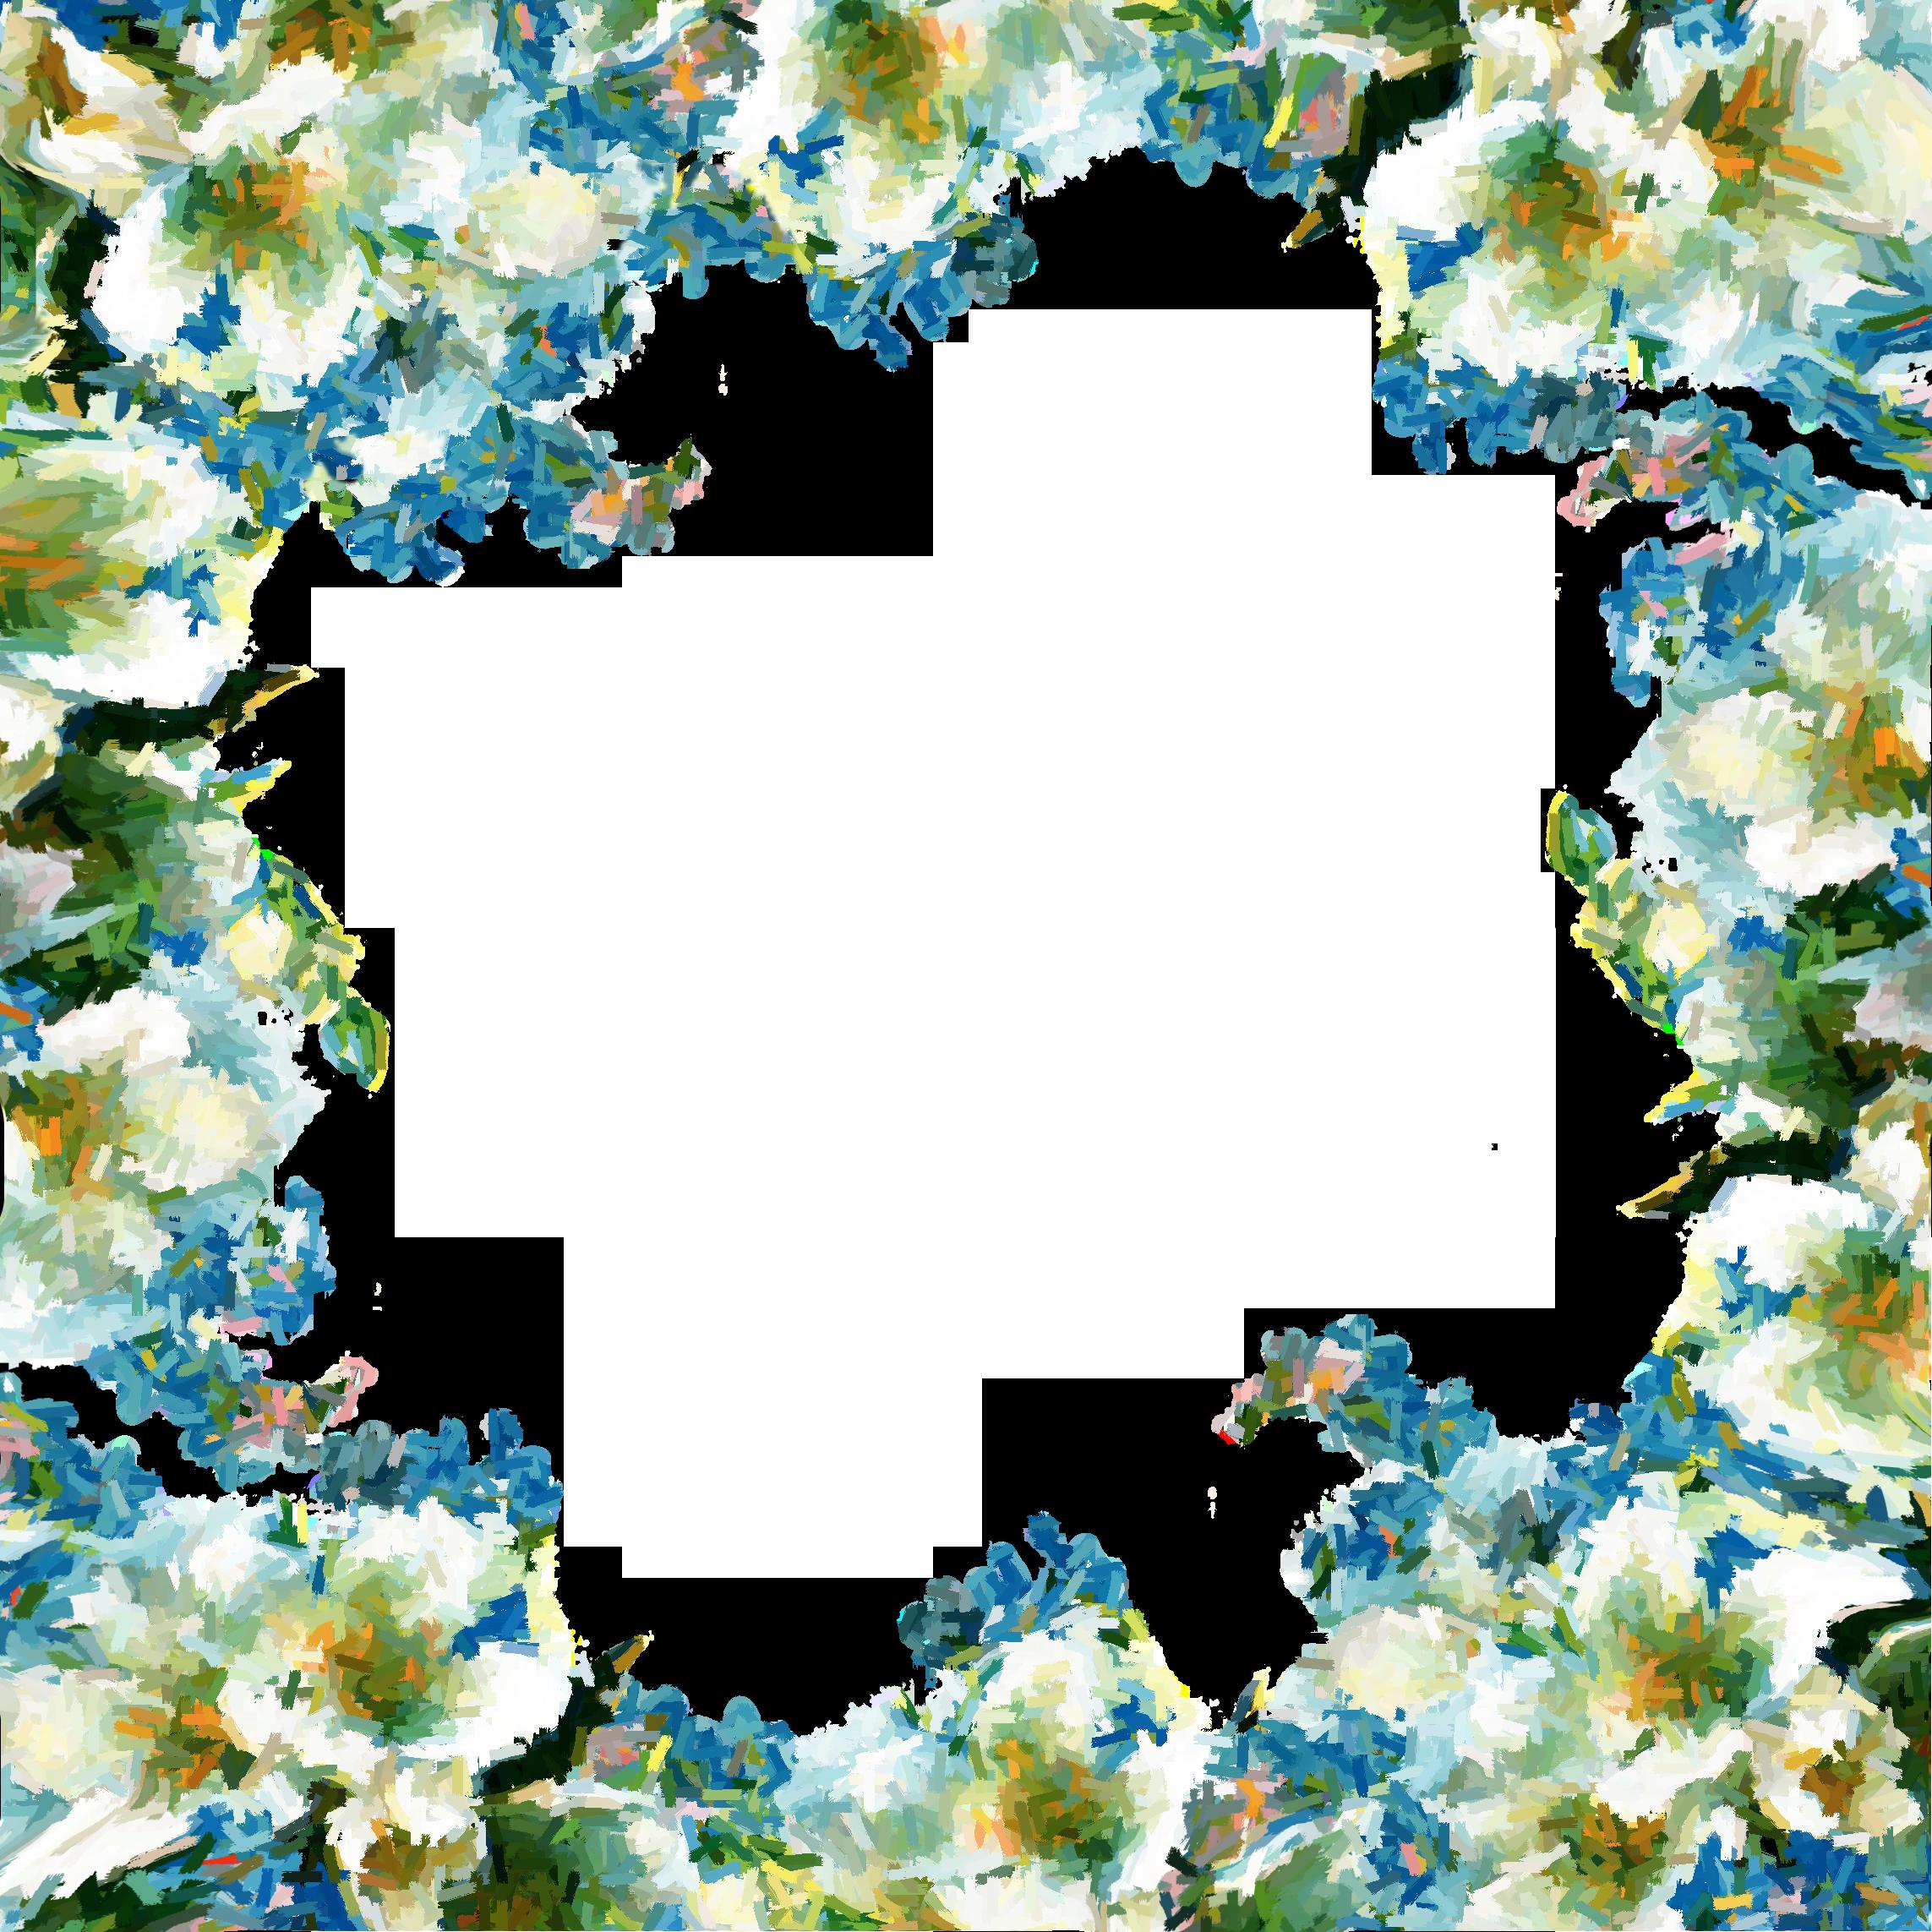 Lenagold - Клипарт - Рамки с цветами и ...: lenagold.ru/fon/clipart/r/ram/flo7.html